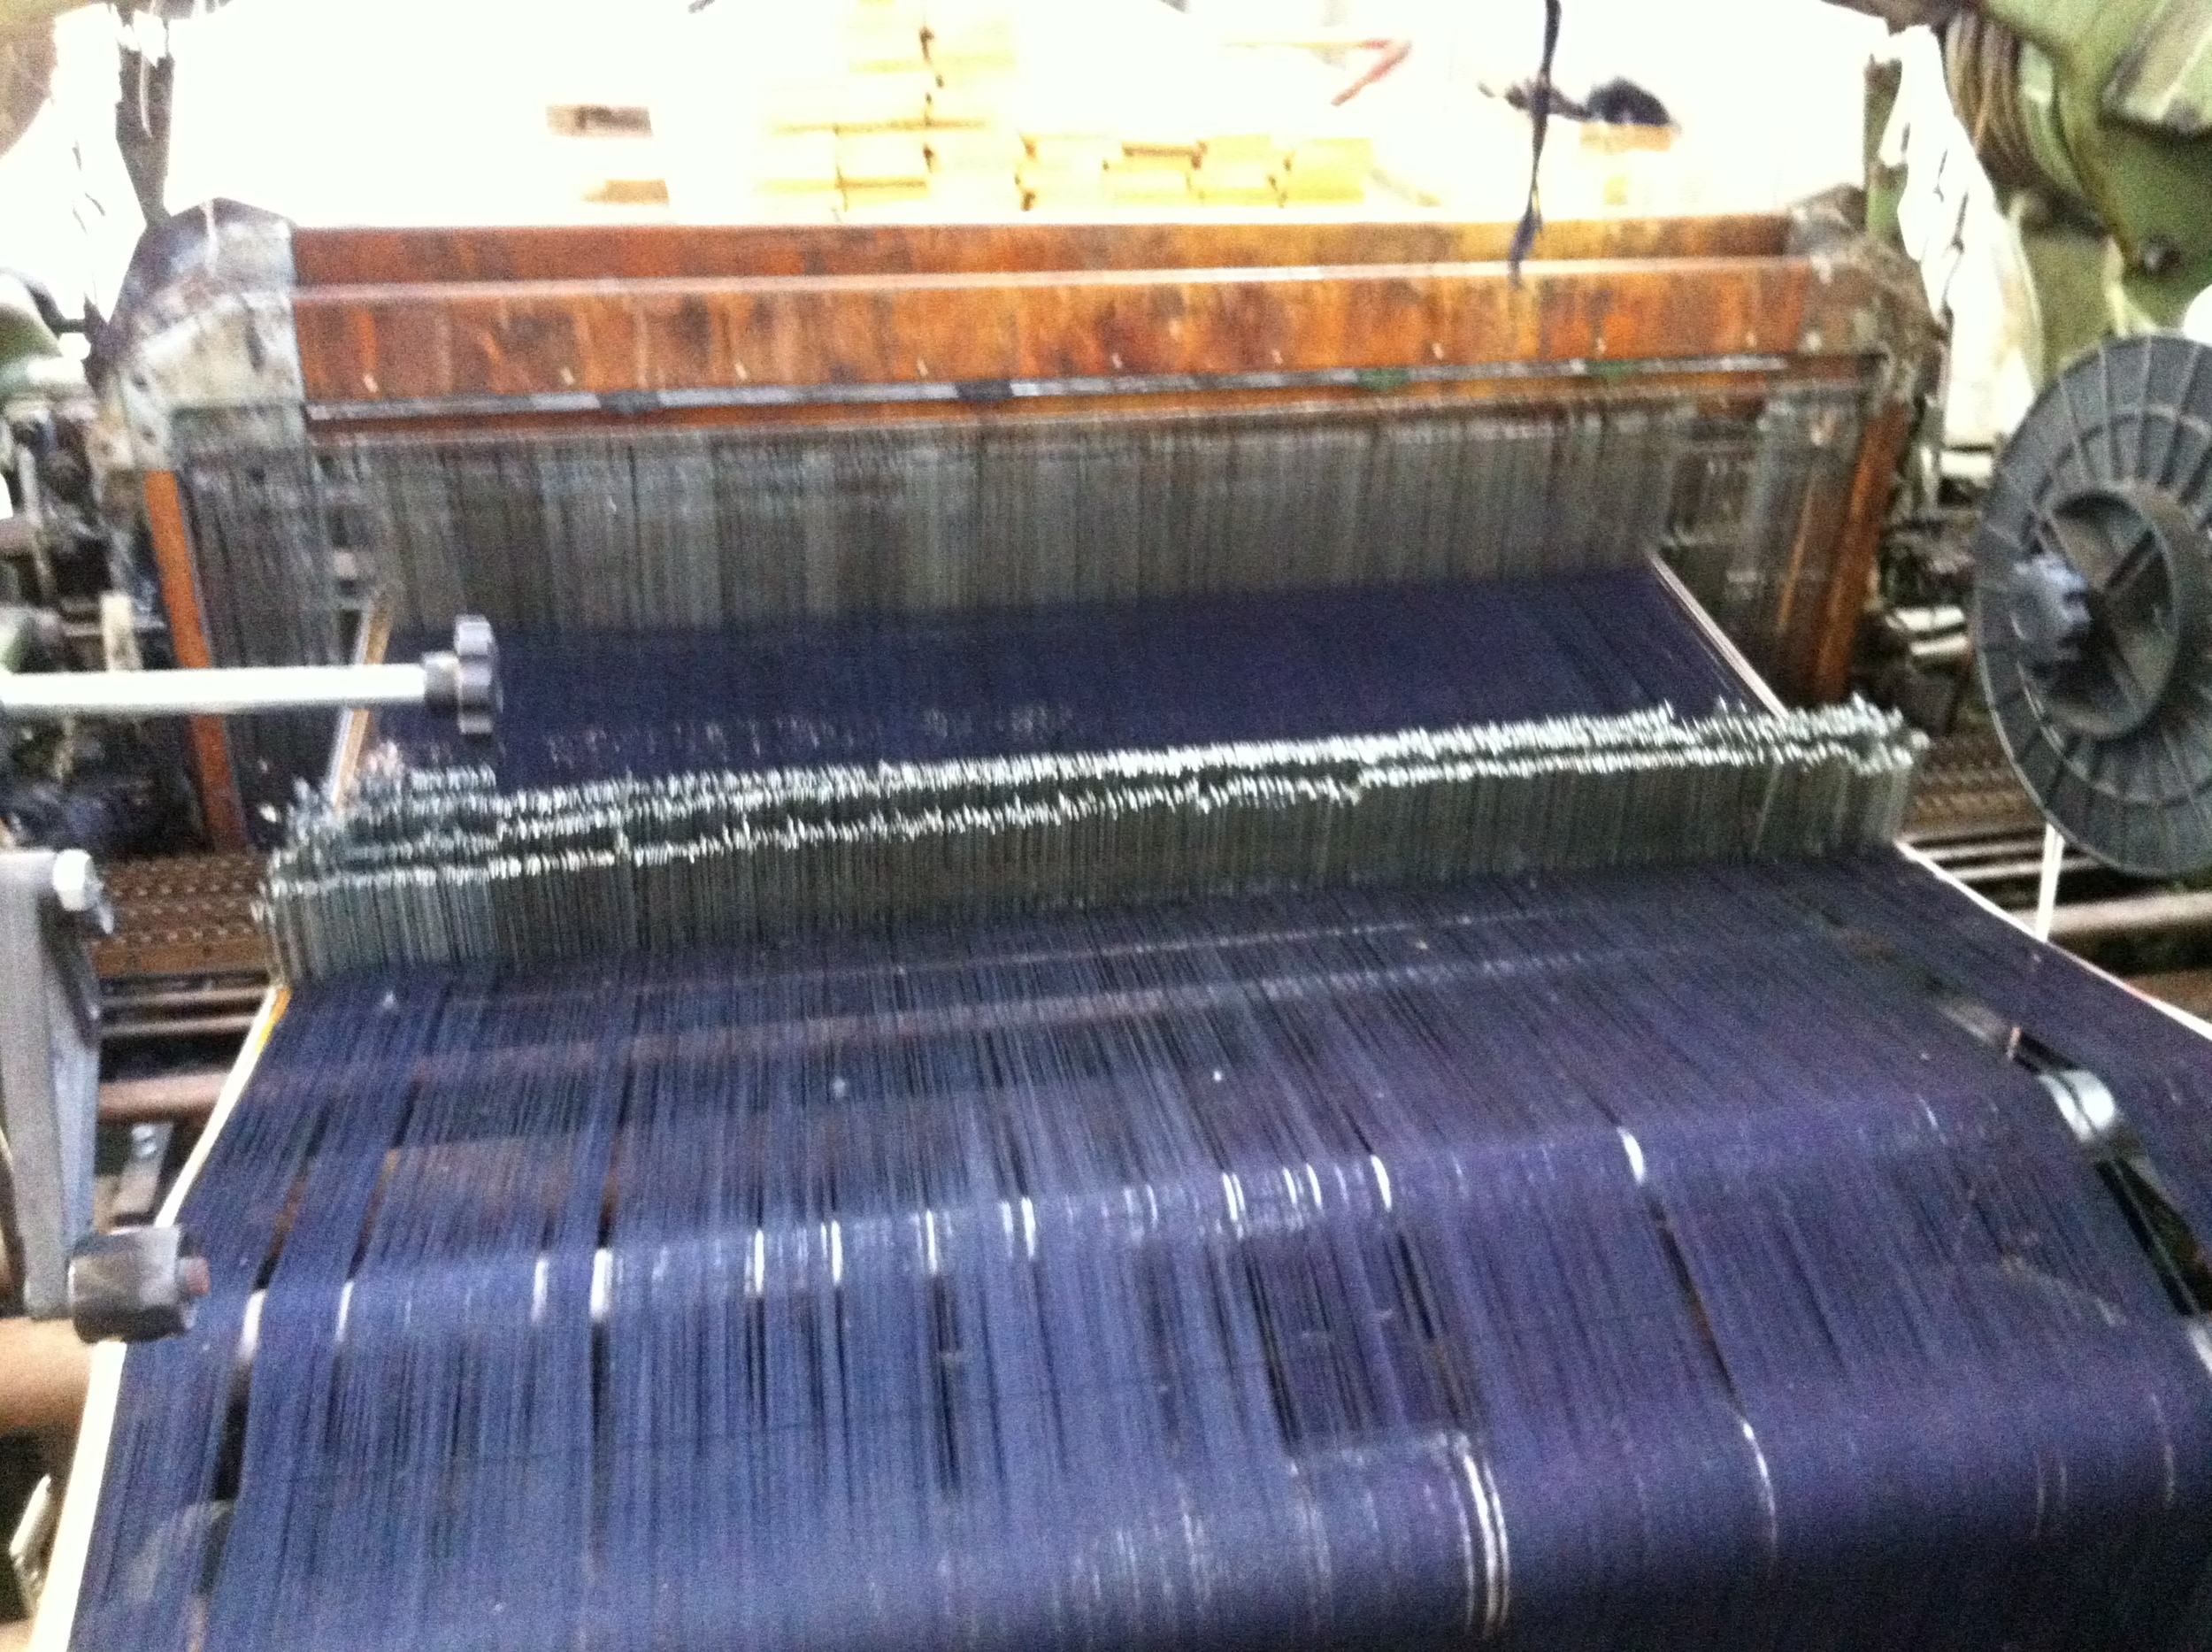 Indigo warp (with white selvedge) set up on beautiful vintage looms.